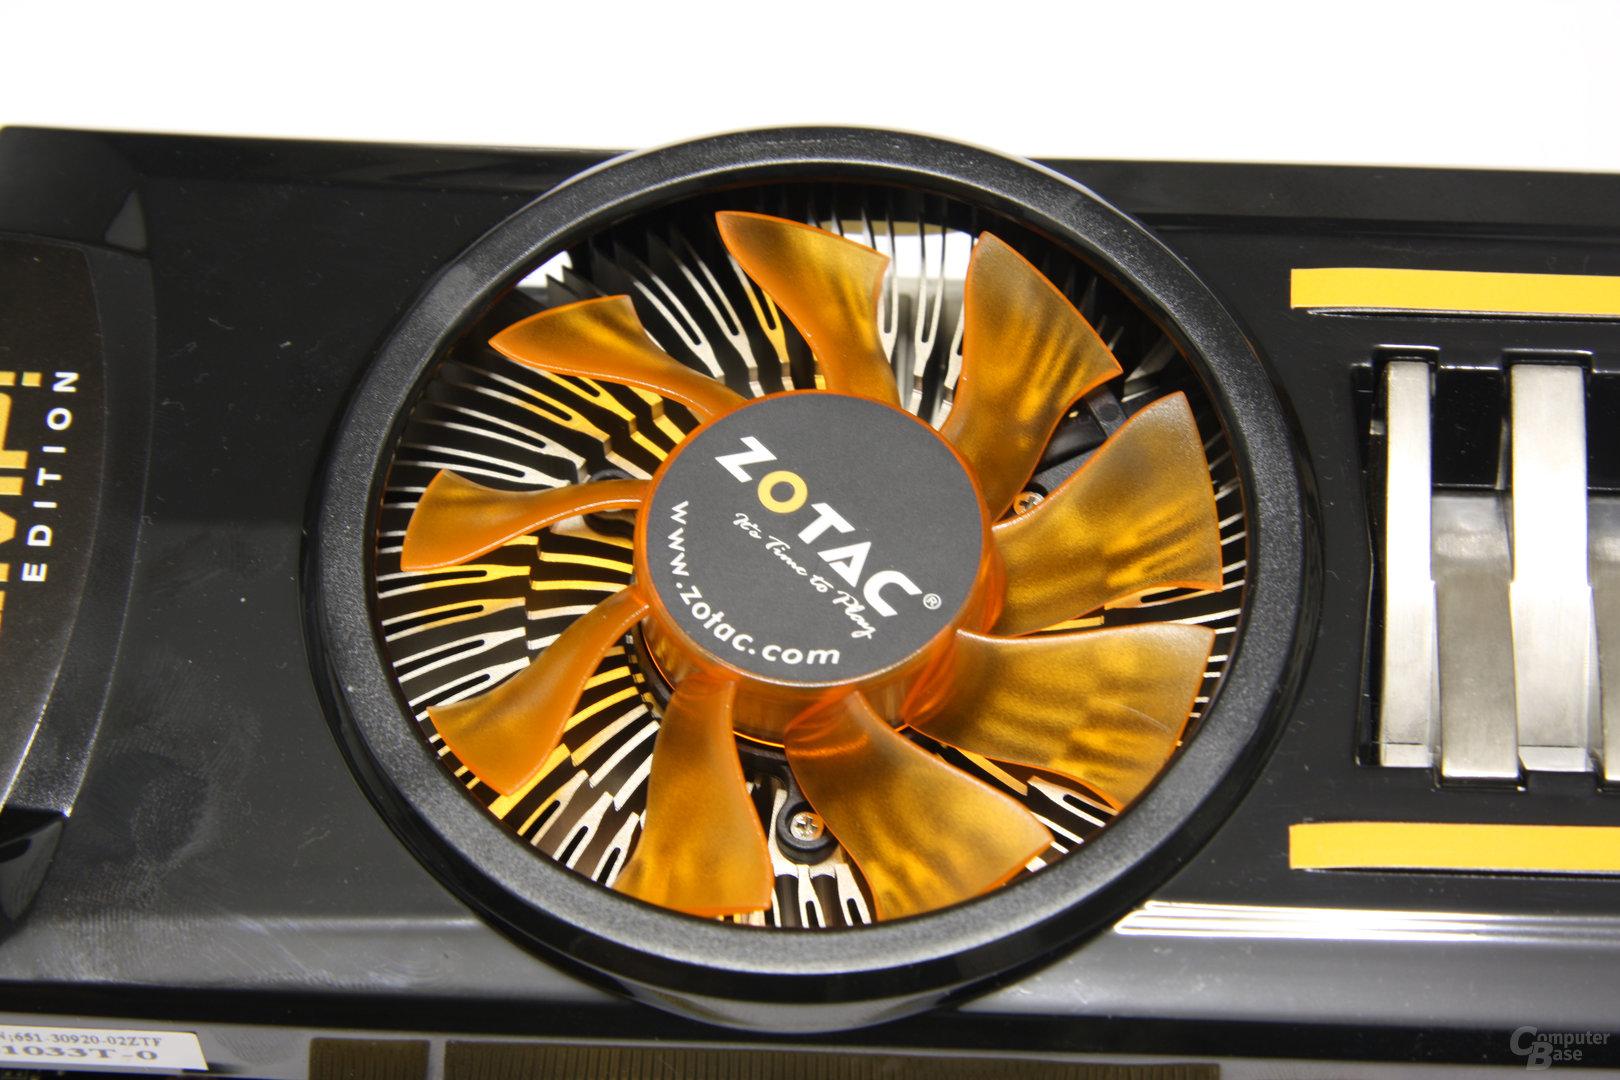 GeForce GTX 460 AMP! Lüfter